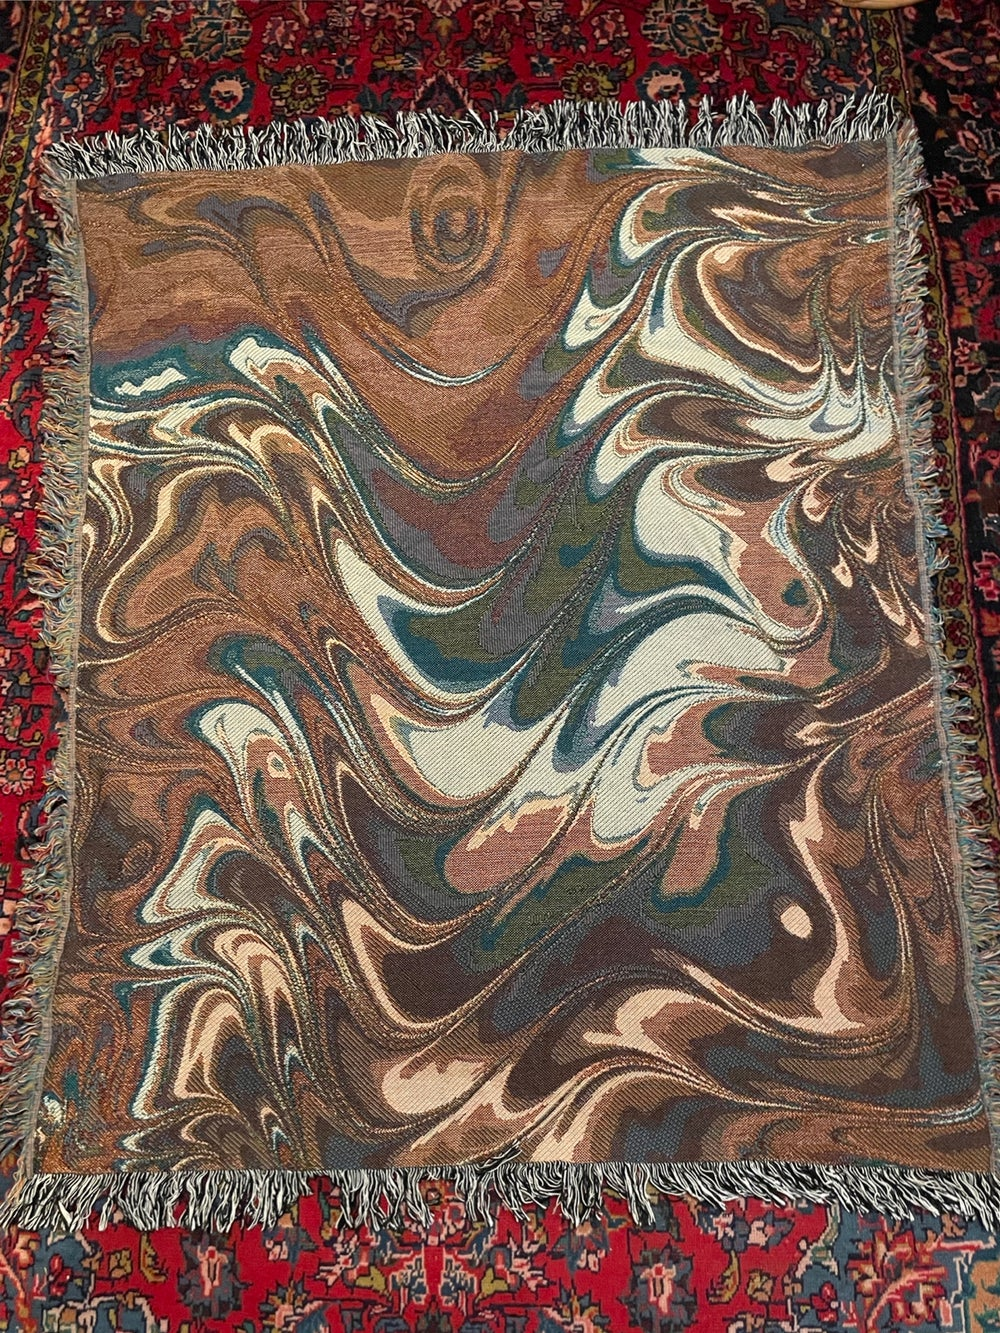 Woven Blanket #33